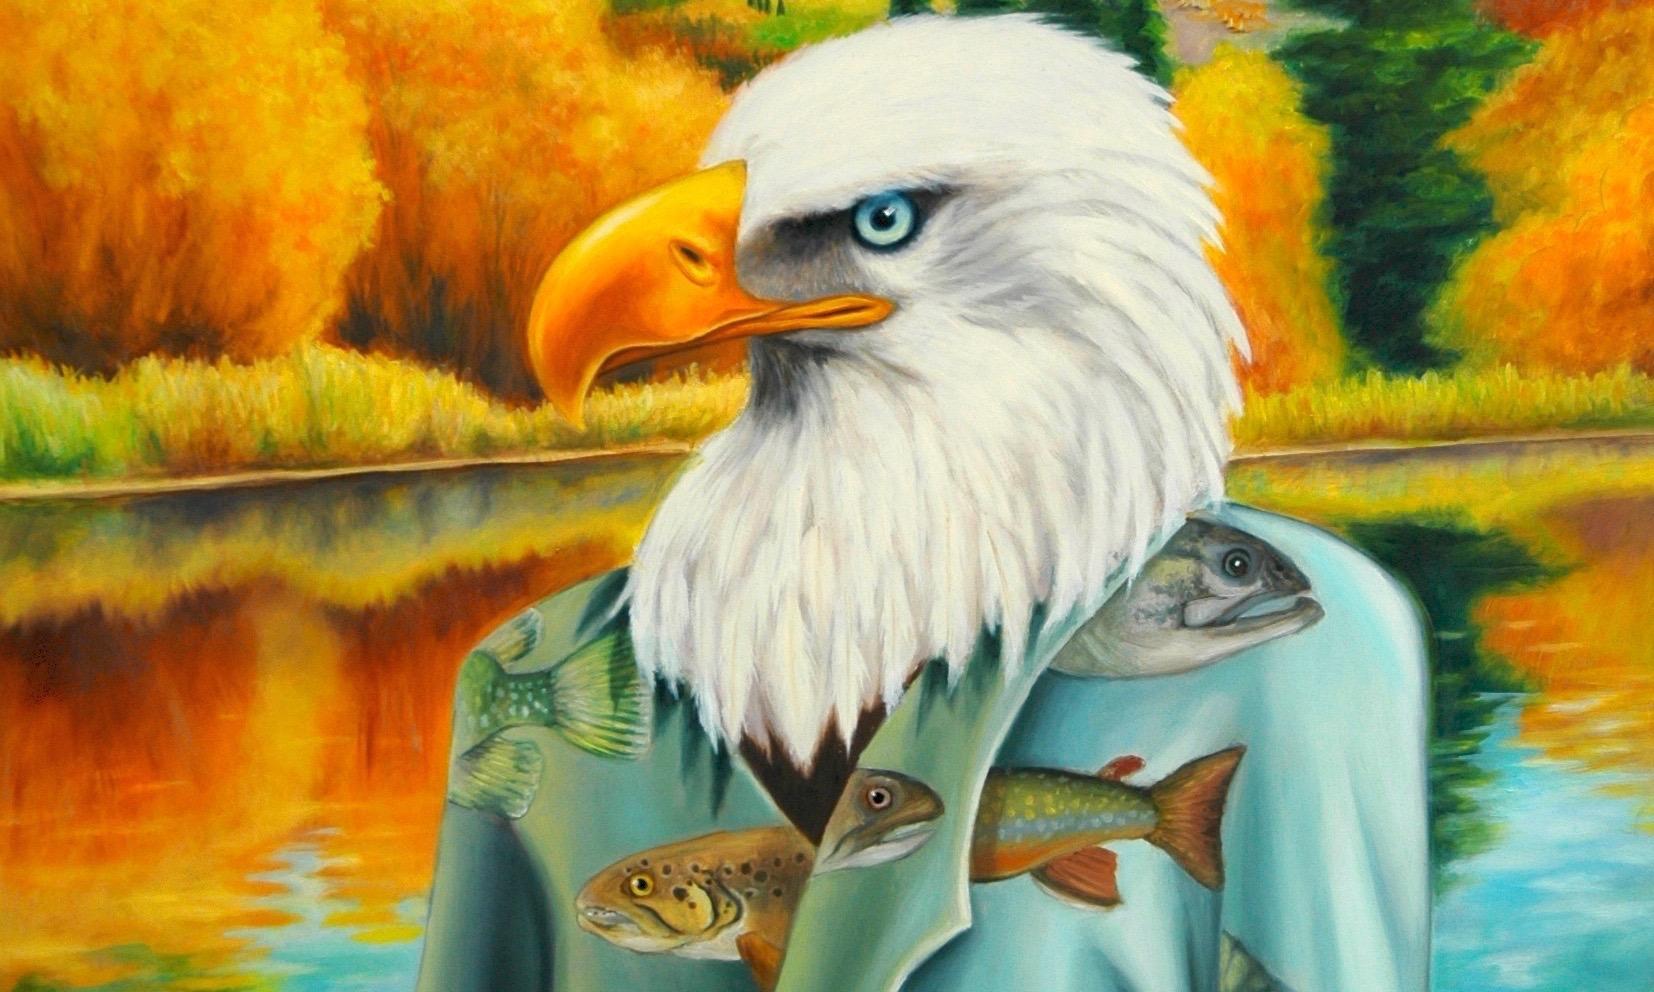 Buy Art - Coming Soon:Paintings, Pottery, Drawings, Sculpture